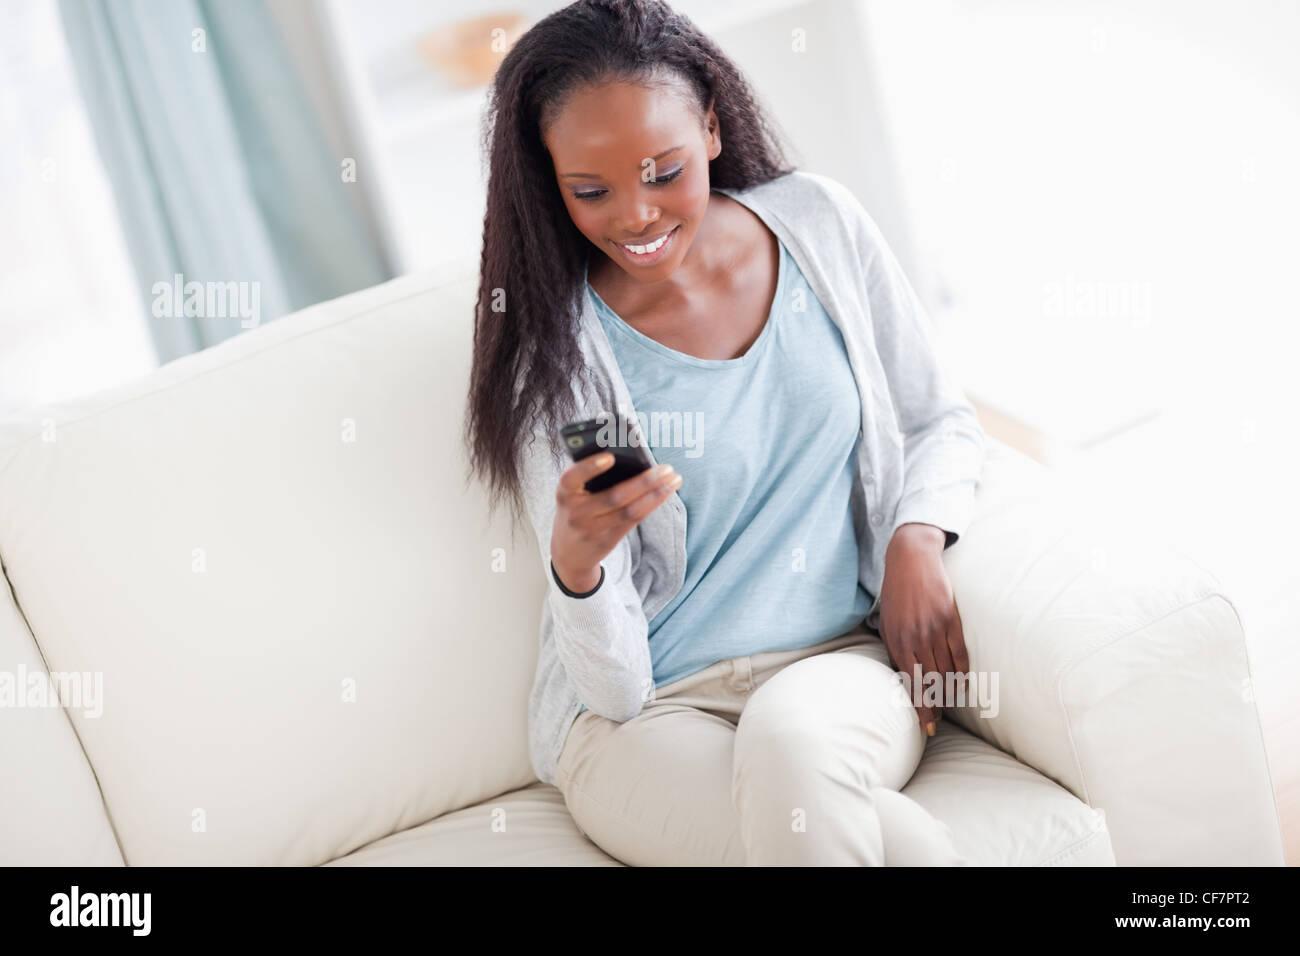 Frau auf Couch SMS lesen Stockbild